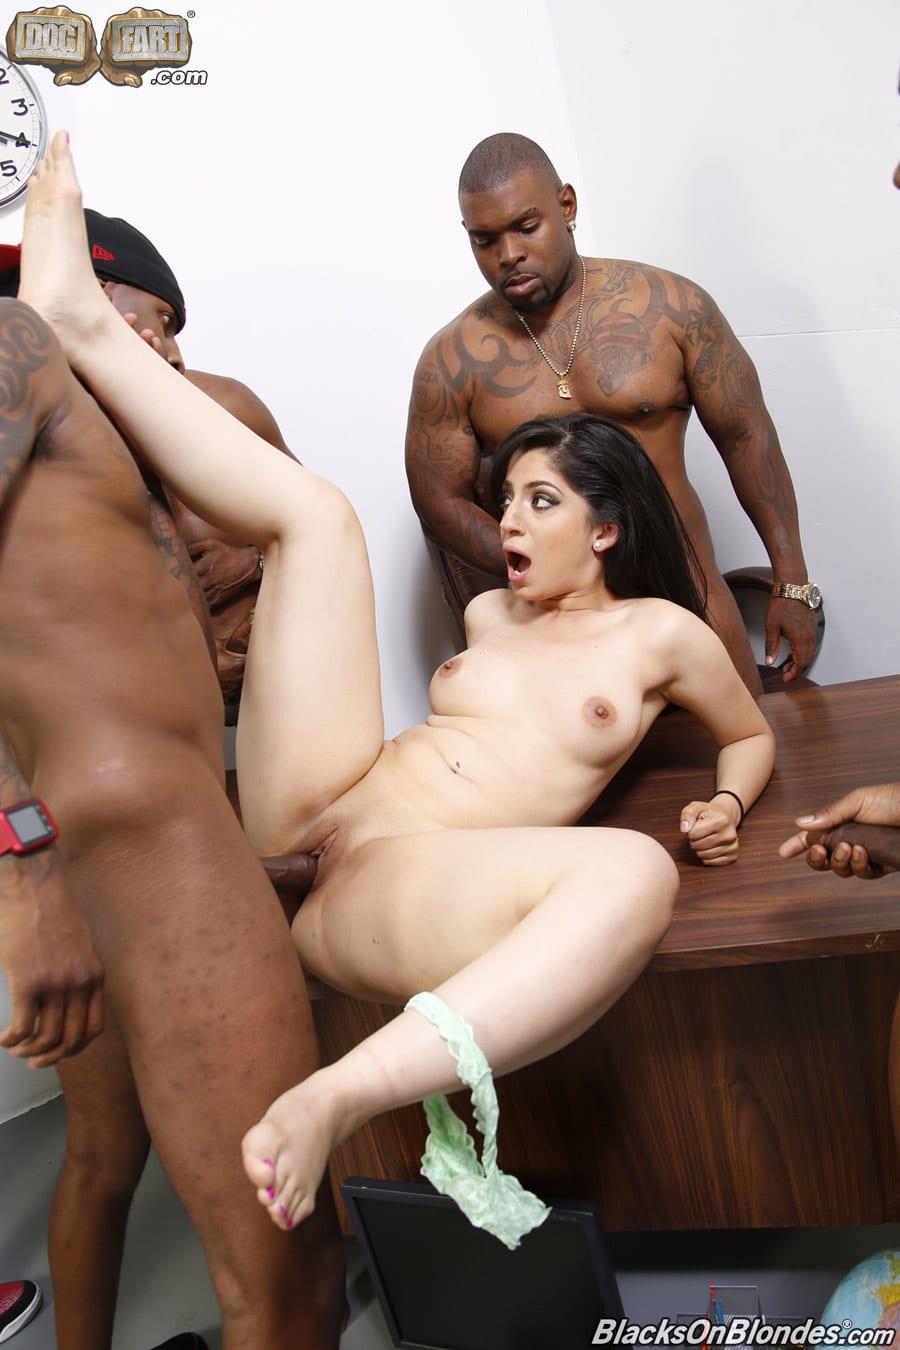 nadia-ali-gangbang-interracial-blacksonblondes-17